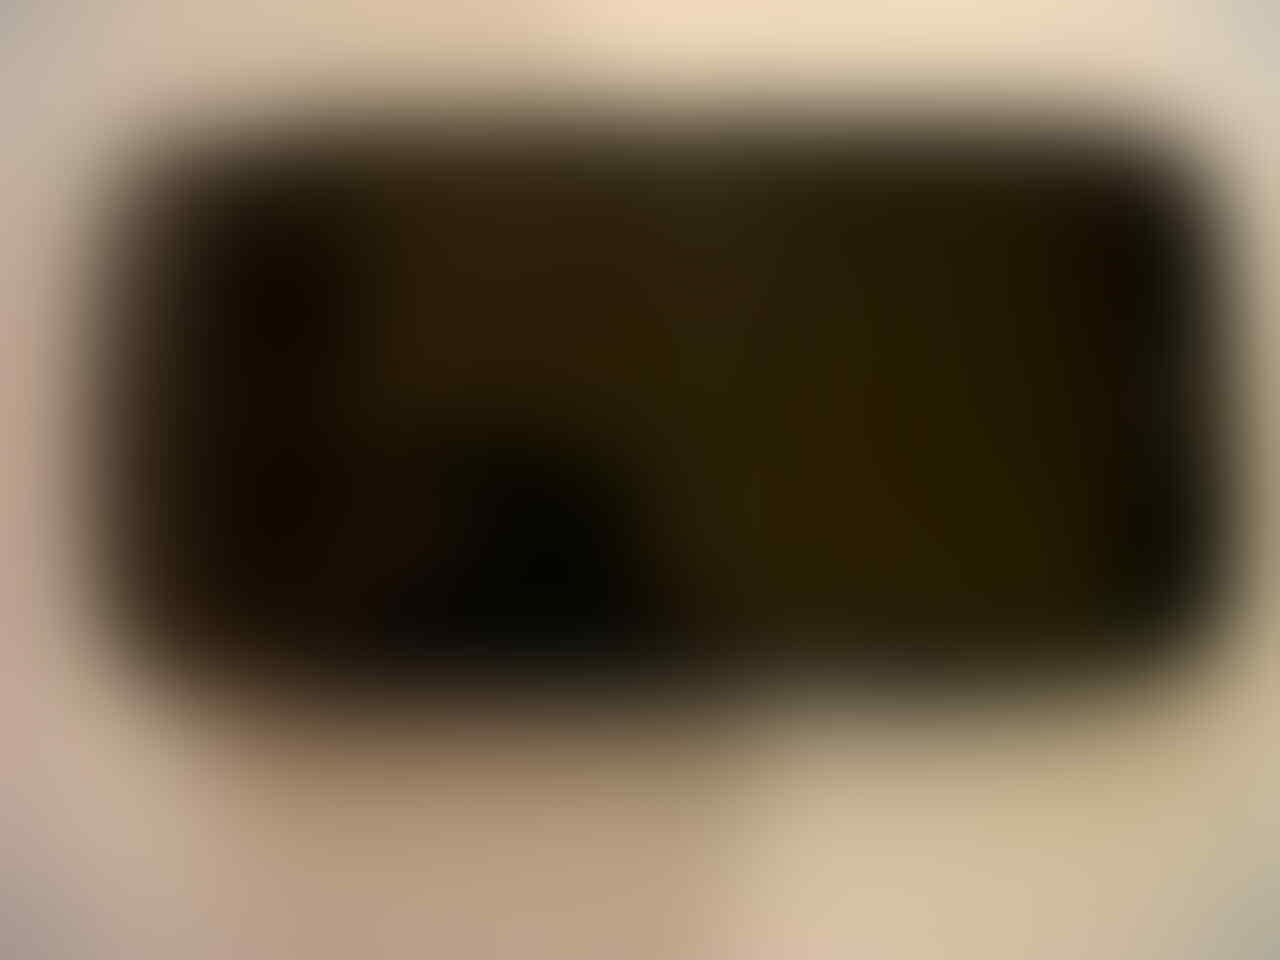 di Jual Nokia Lumia 610